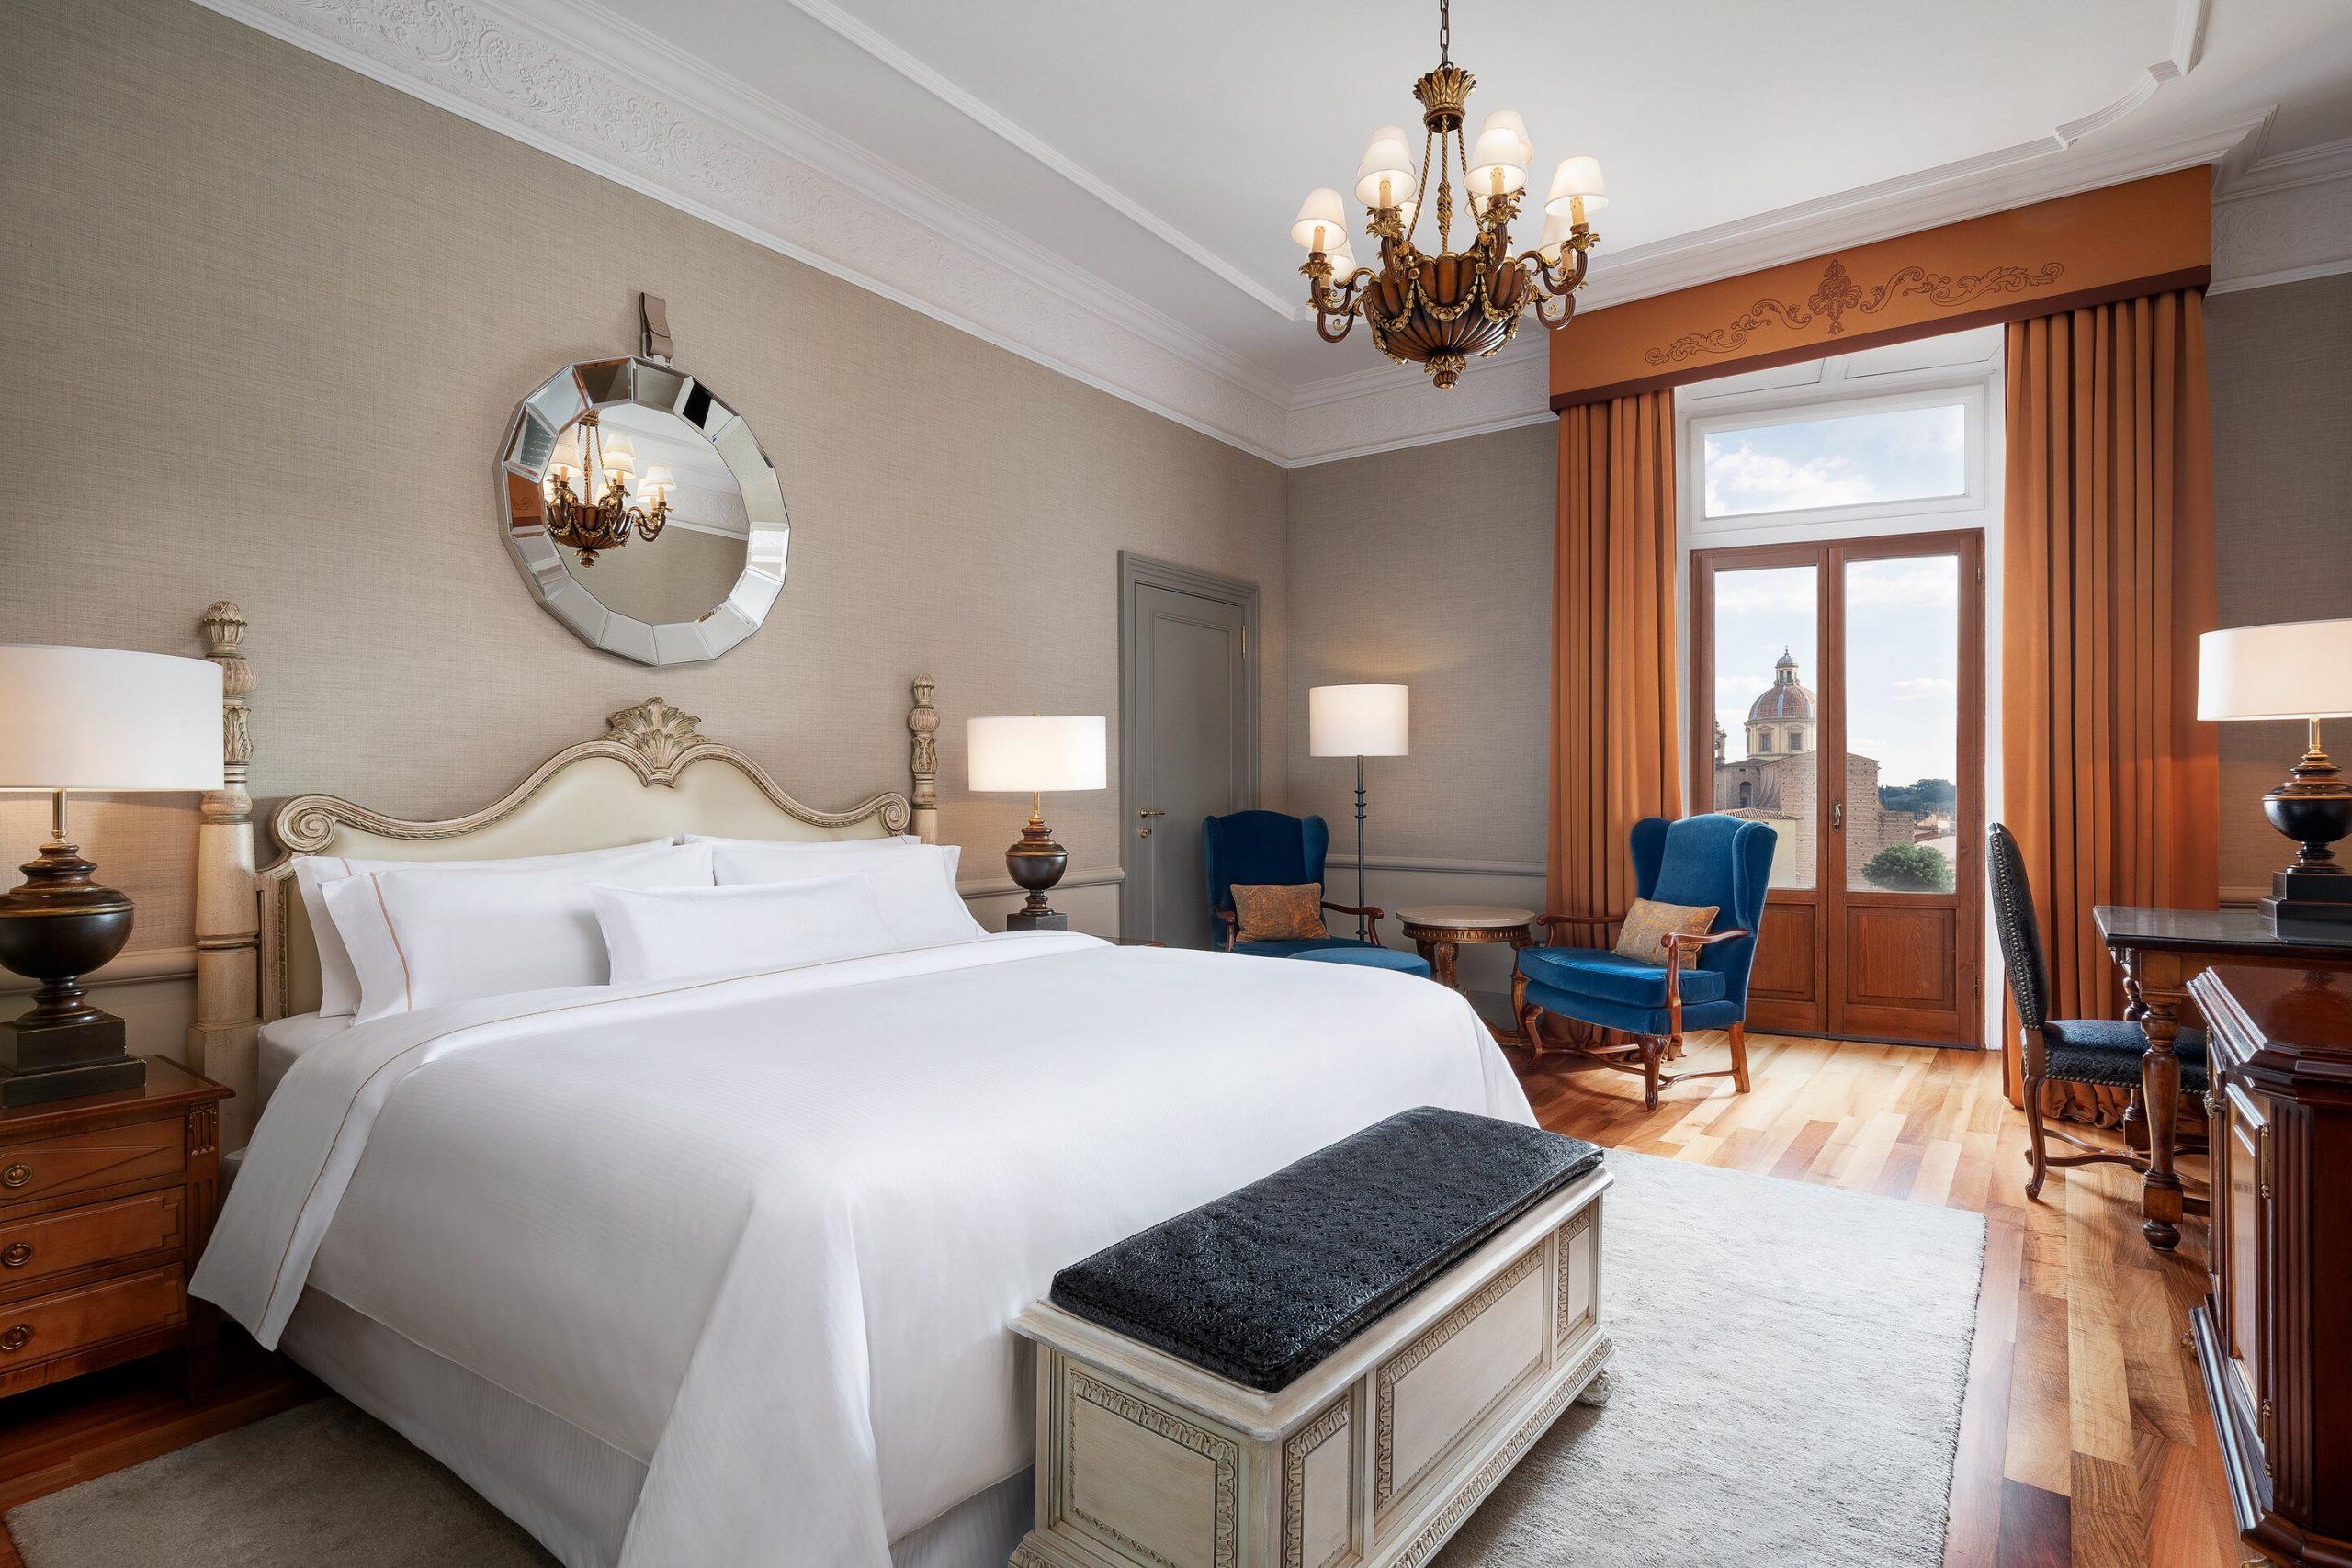 flrwi-king-guestroom-5983-hor-clsc